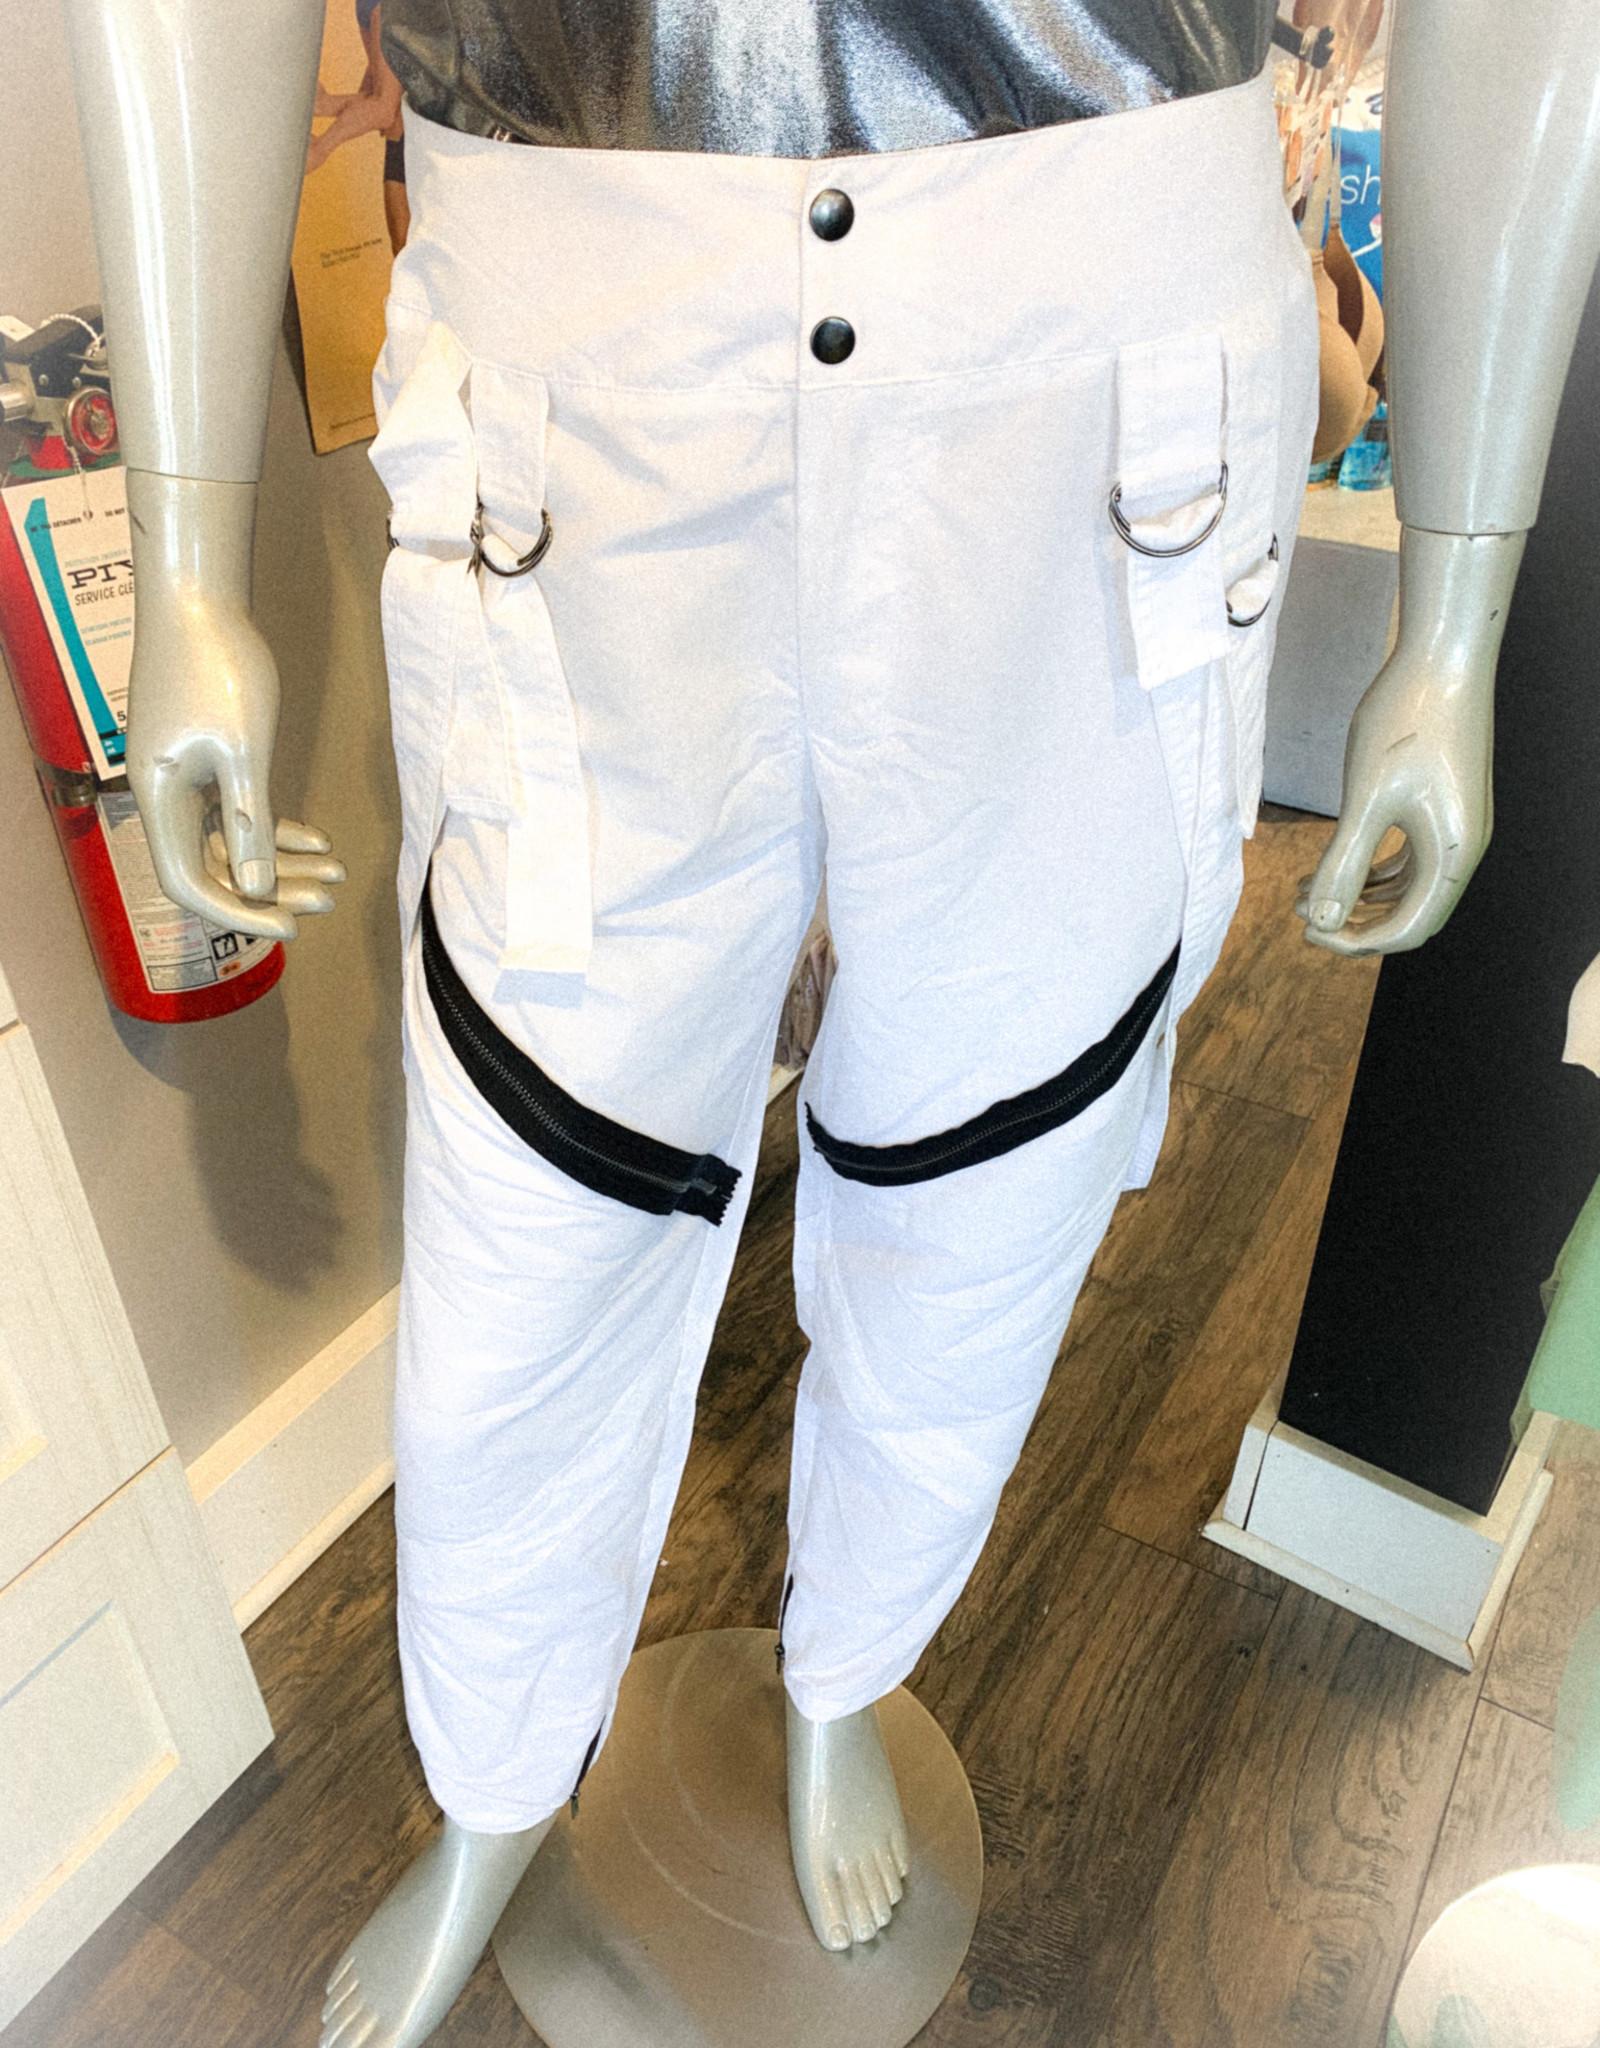 Pantalon Blanc Avec Bretelles Et Zipper (Large)